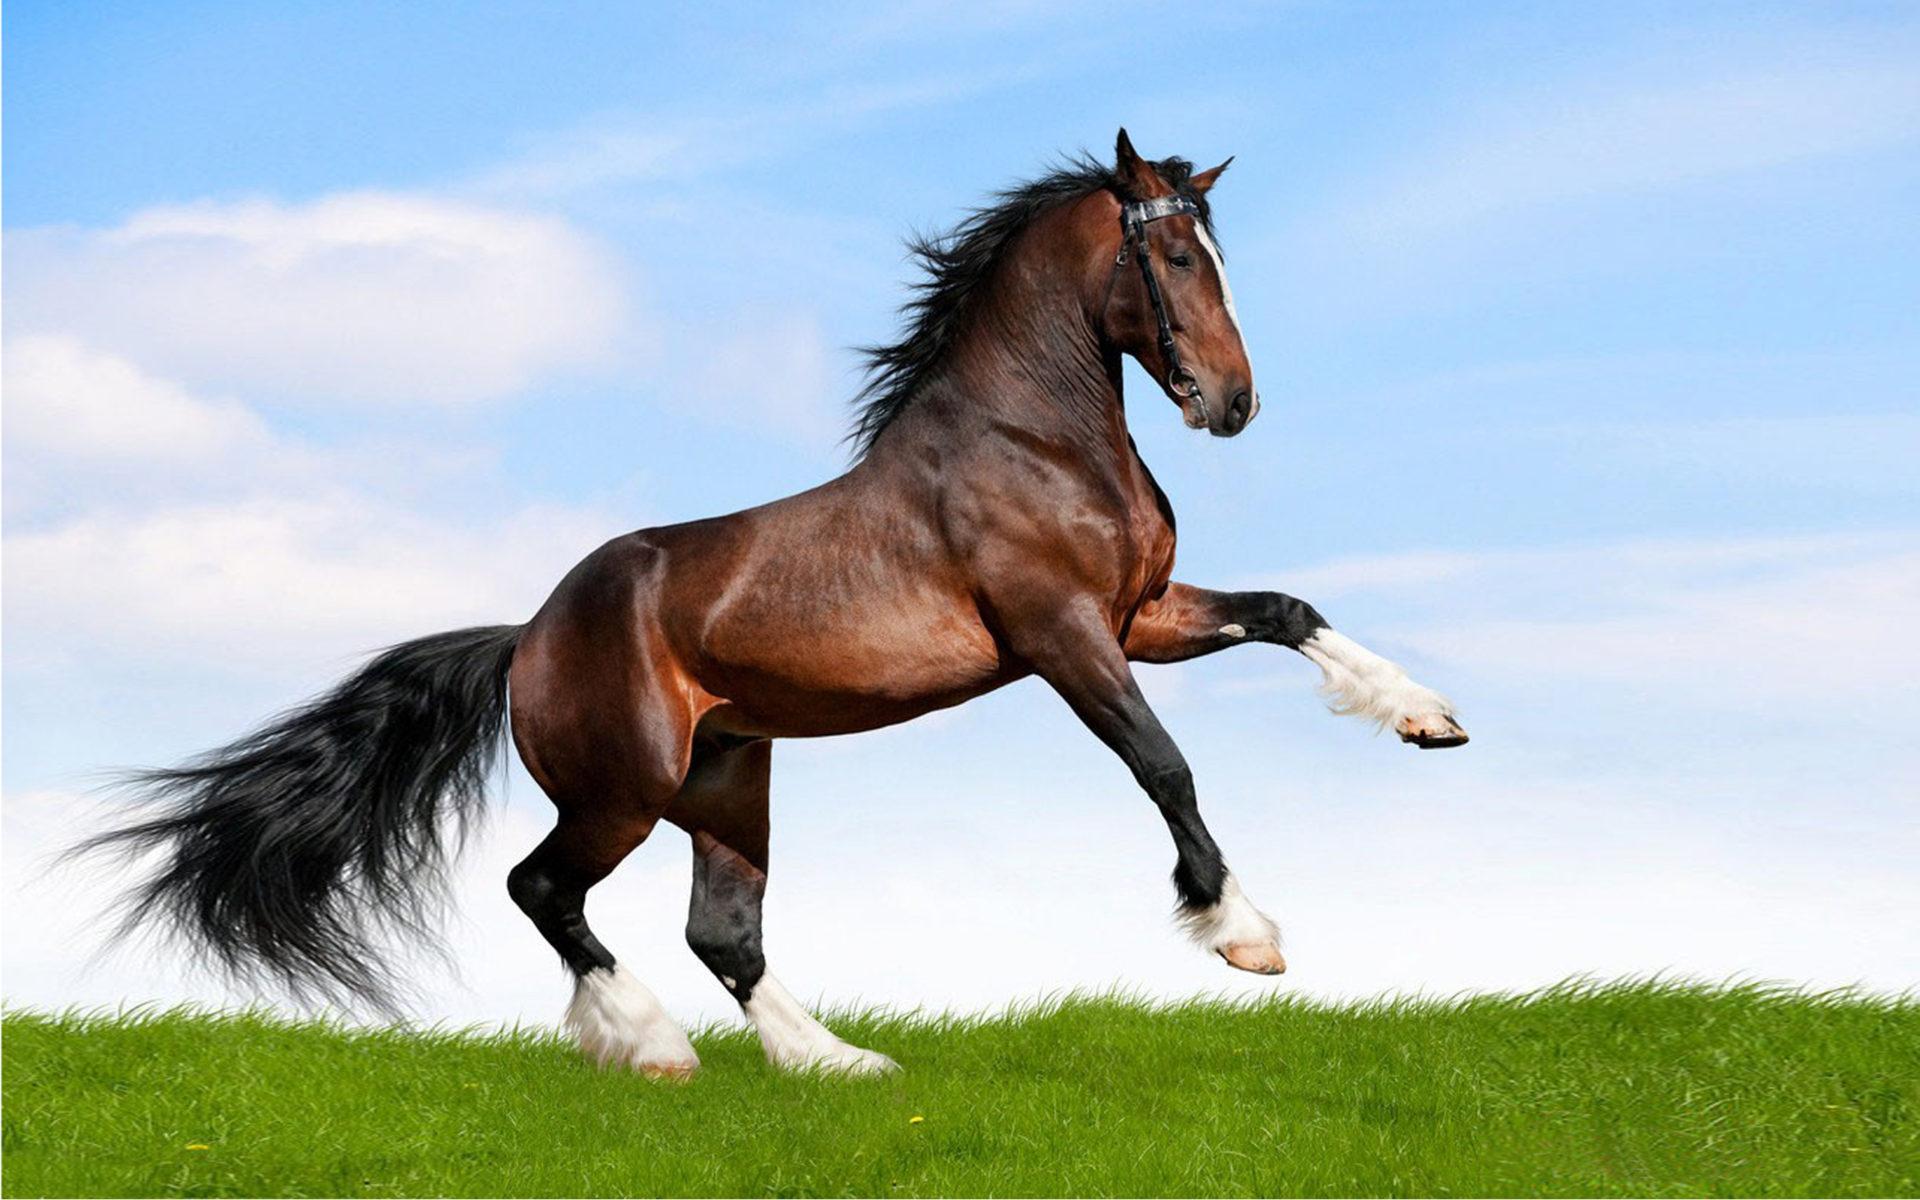 Cute Jungle Wallpaper Large Black Horse Running In A Field Of Green Grass